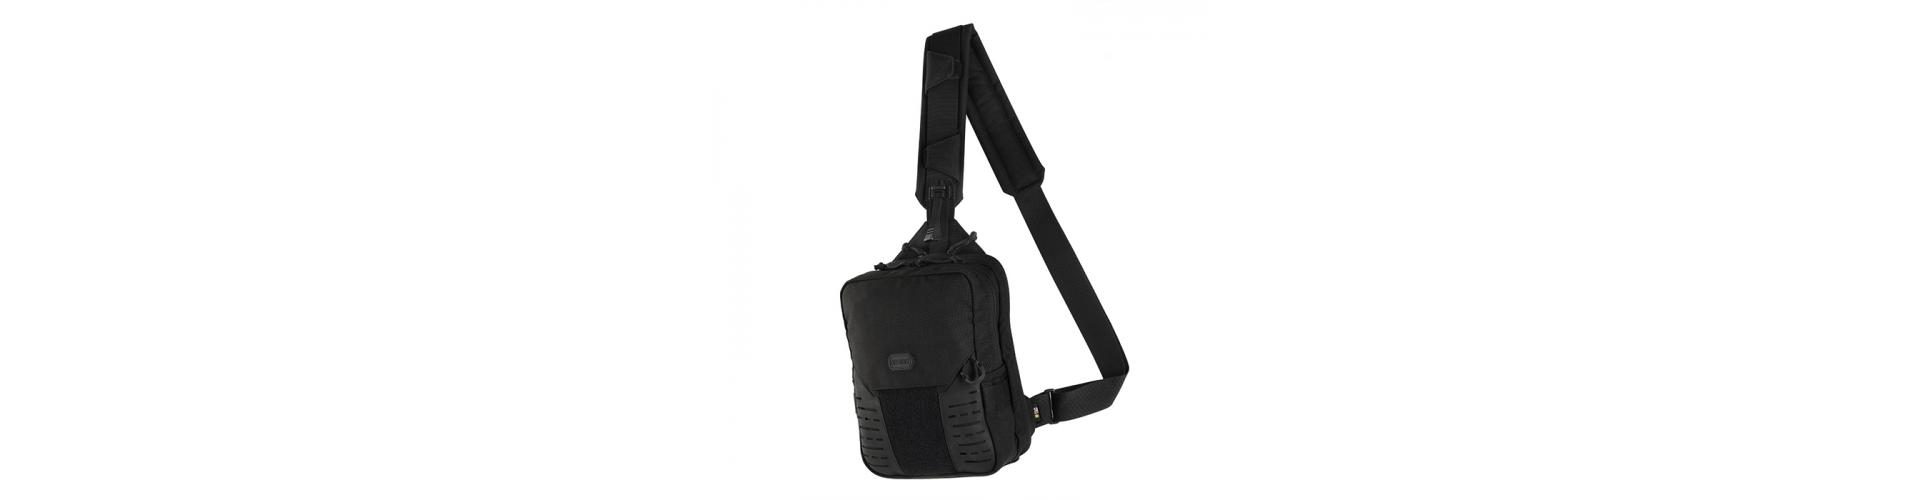 Обзор сумки-кобуры Cube Bag Elite